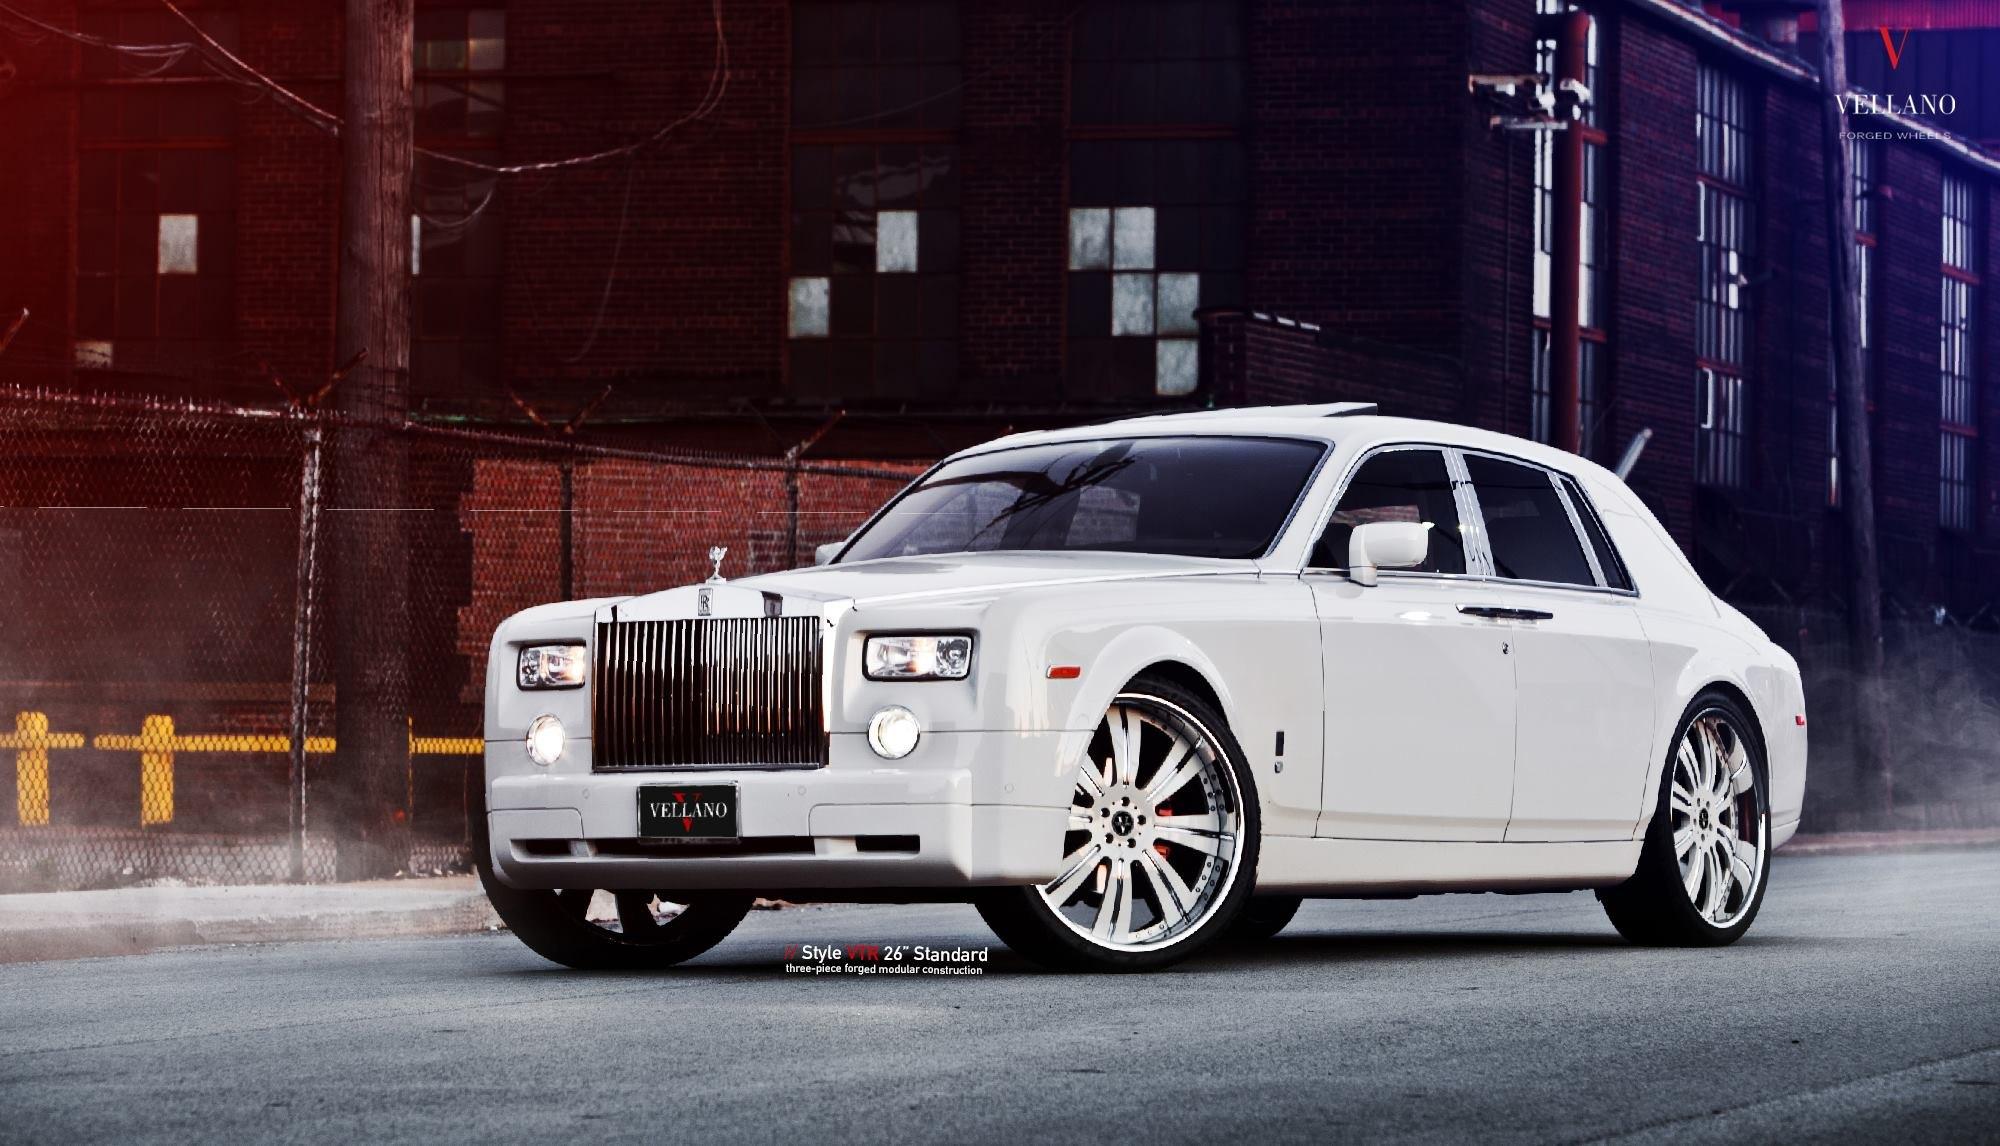 Custom Rolls Royce Phantom Images Mods Photos Upgrades Carid Com Gallery